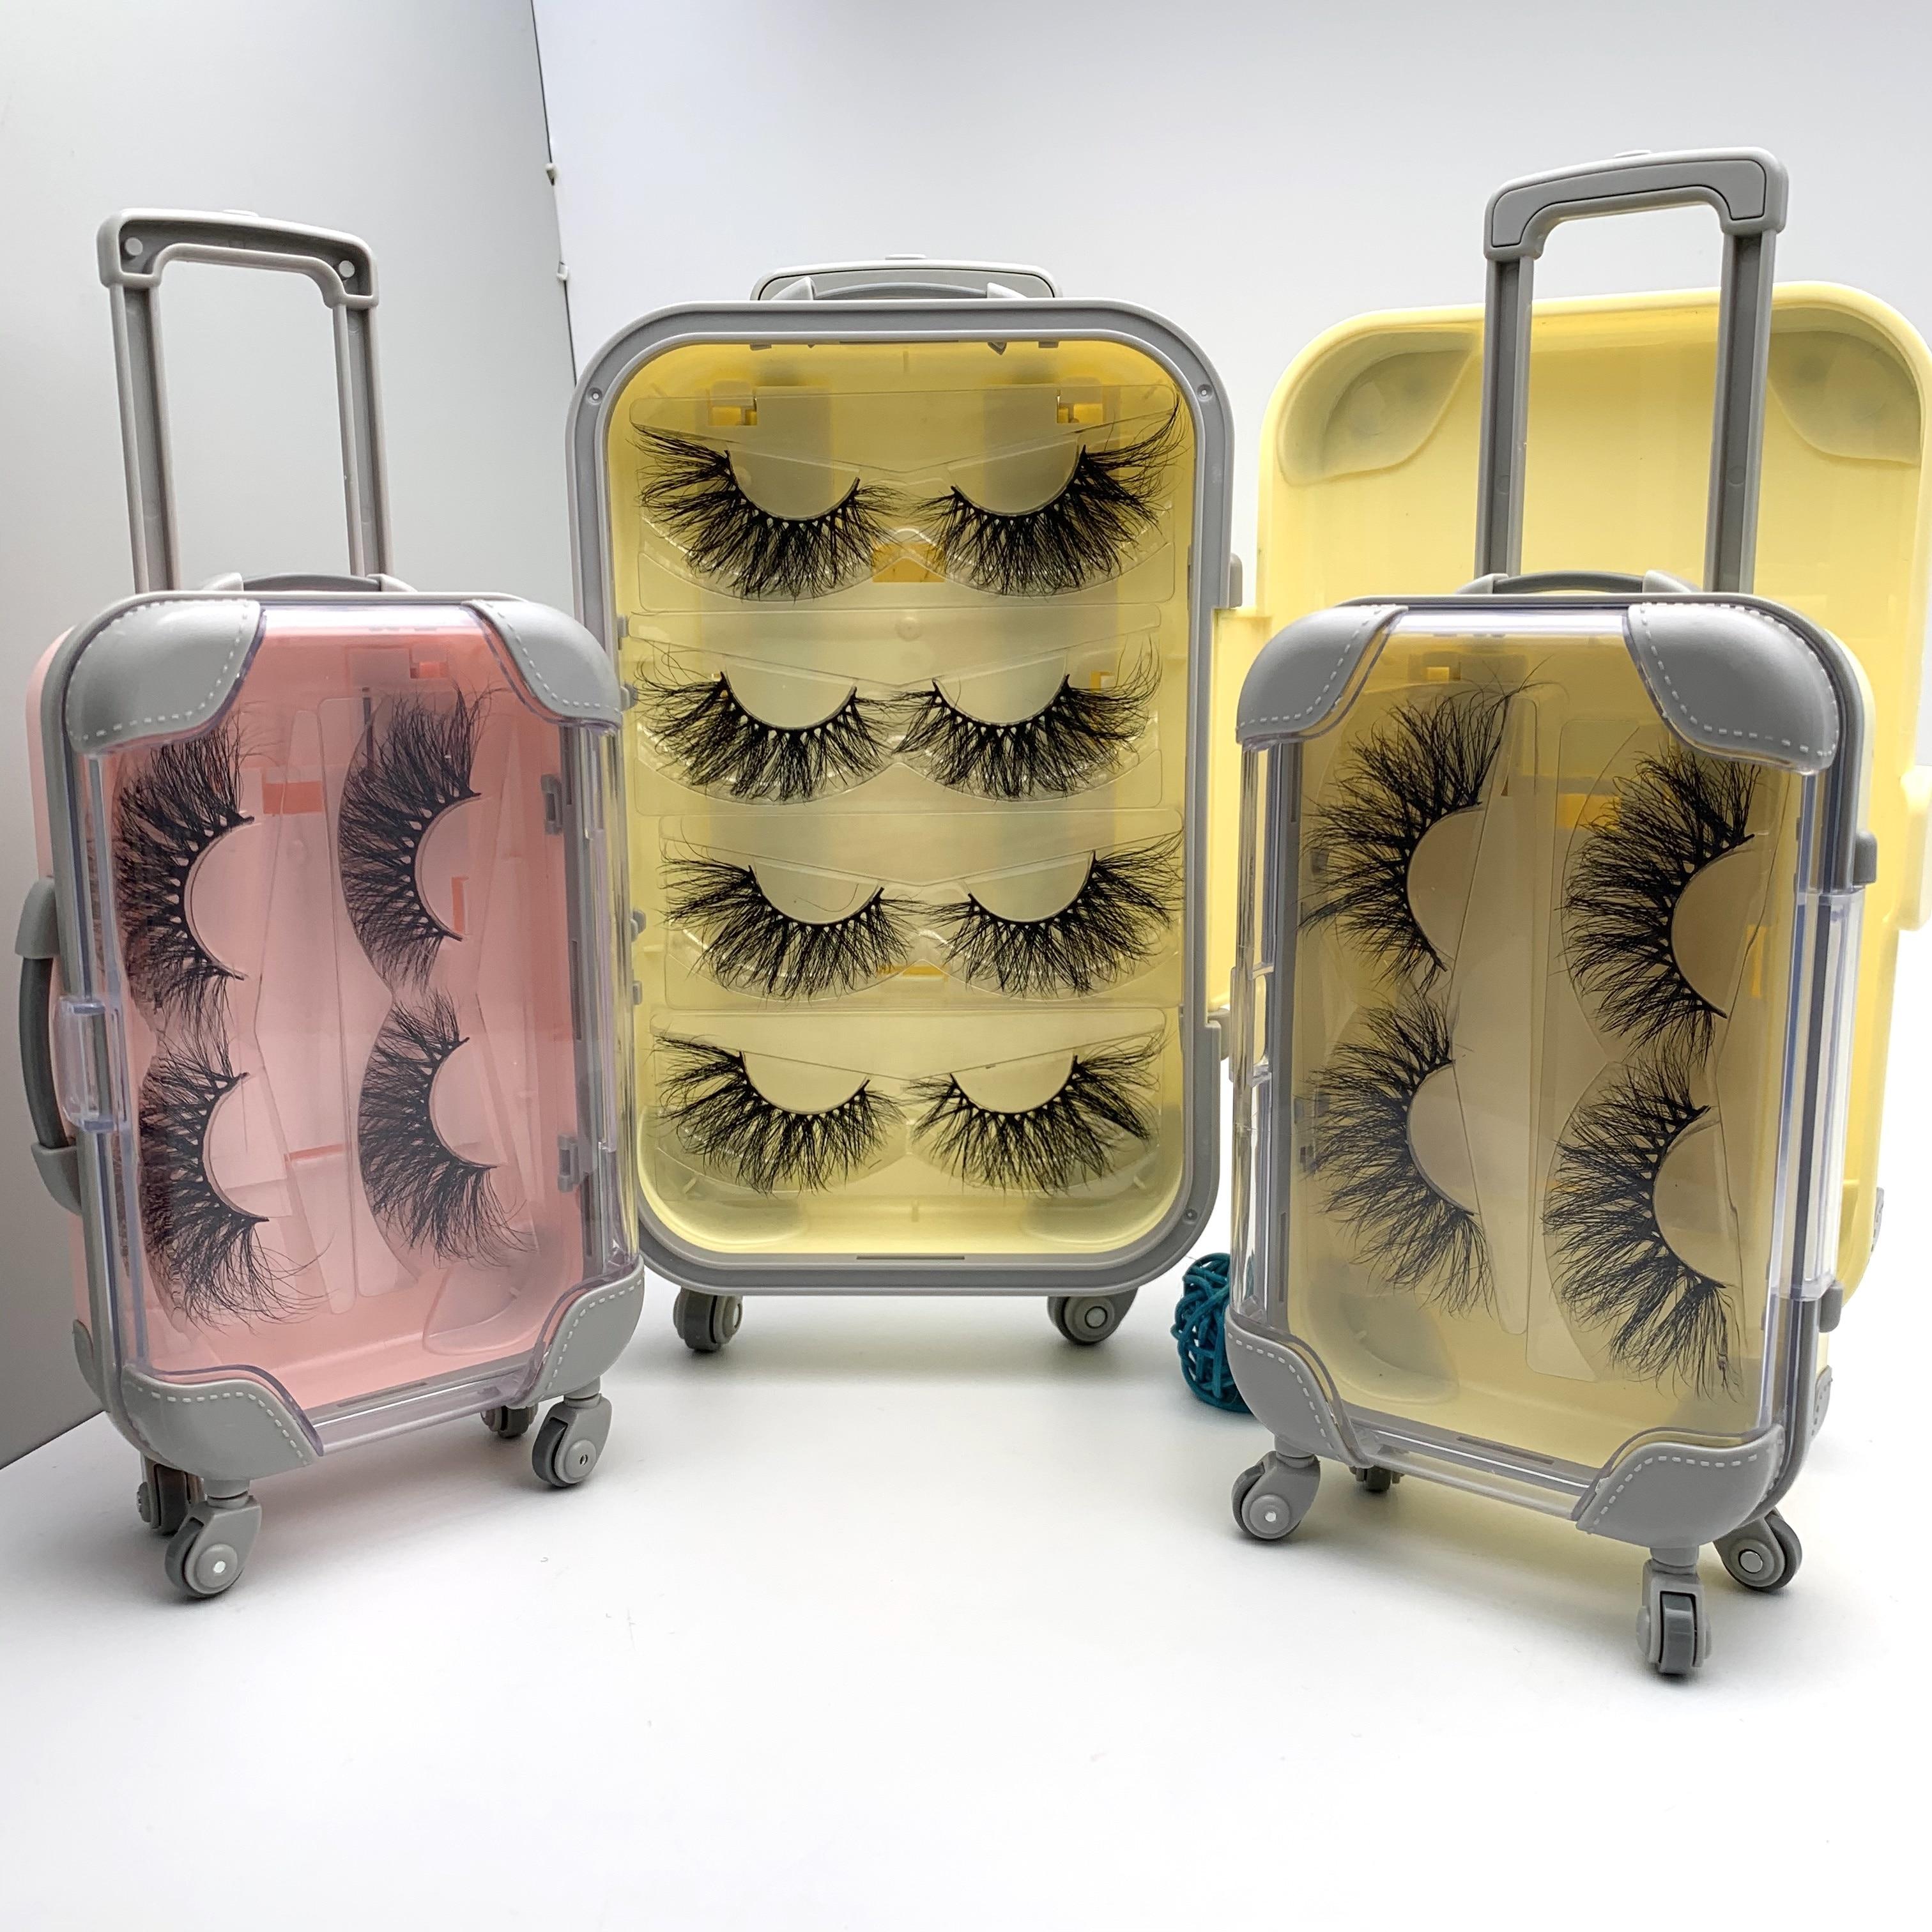 25mm 100% Siberian Mink Lash 2 Pairs Eyelash Packaging Suitcase 3d Mink Eyelash Custom Luggage Case Packaging Box